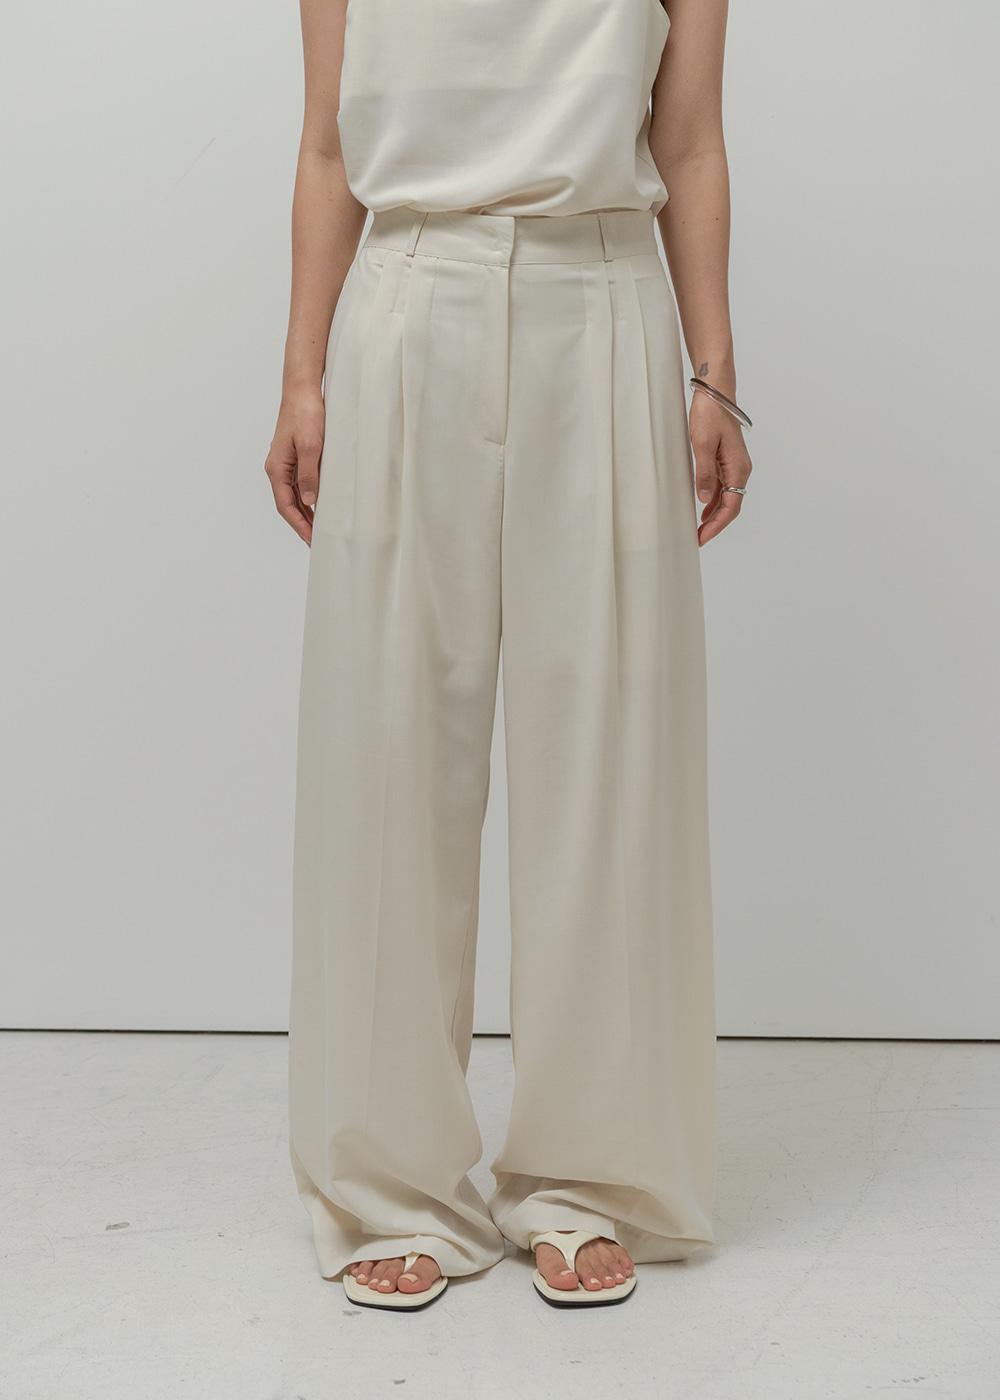 [UNDERROW] Milan Pants